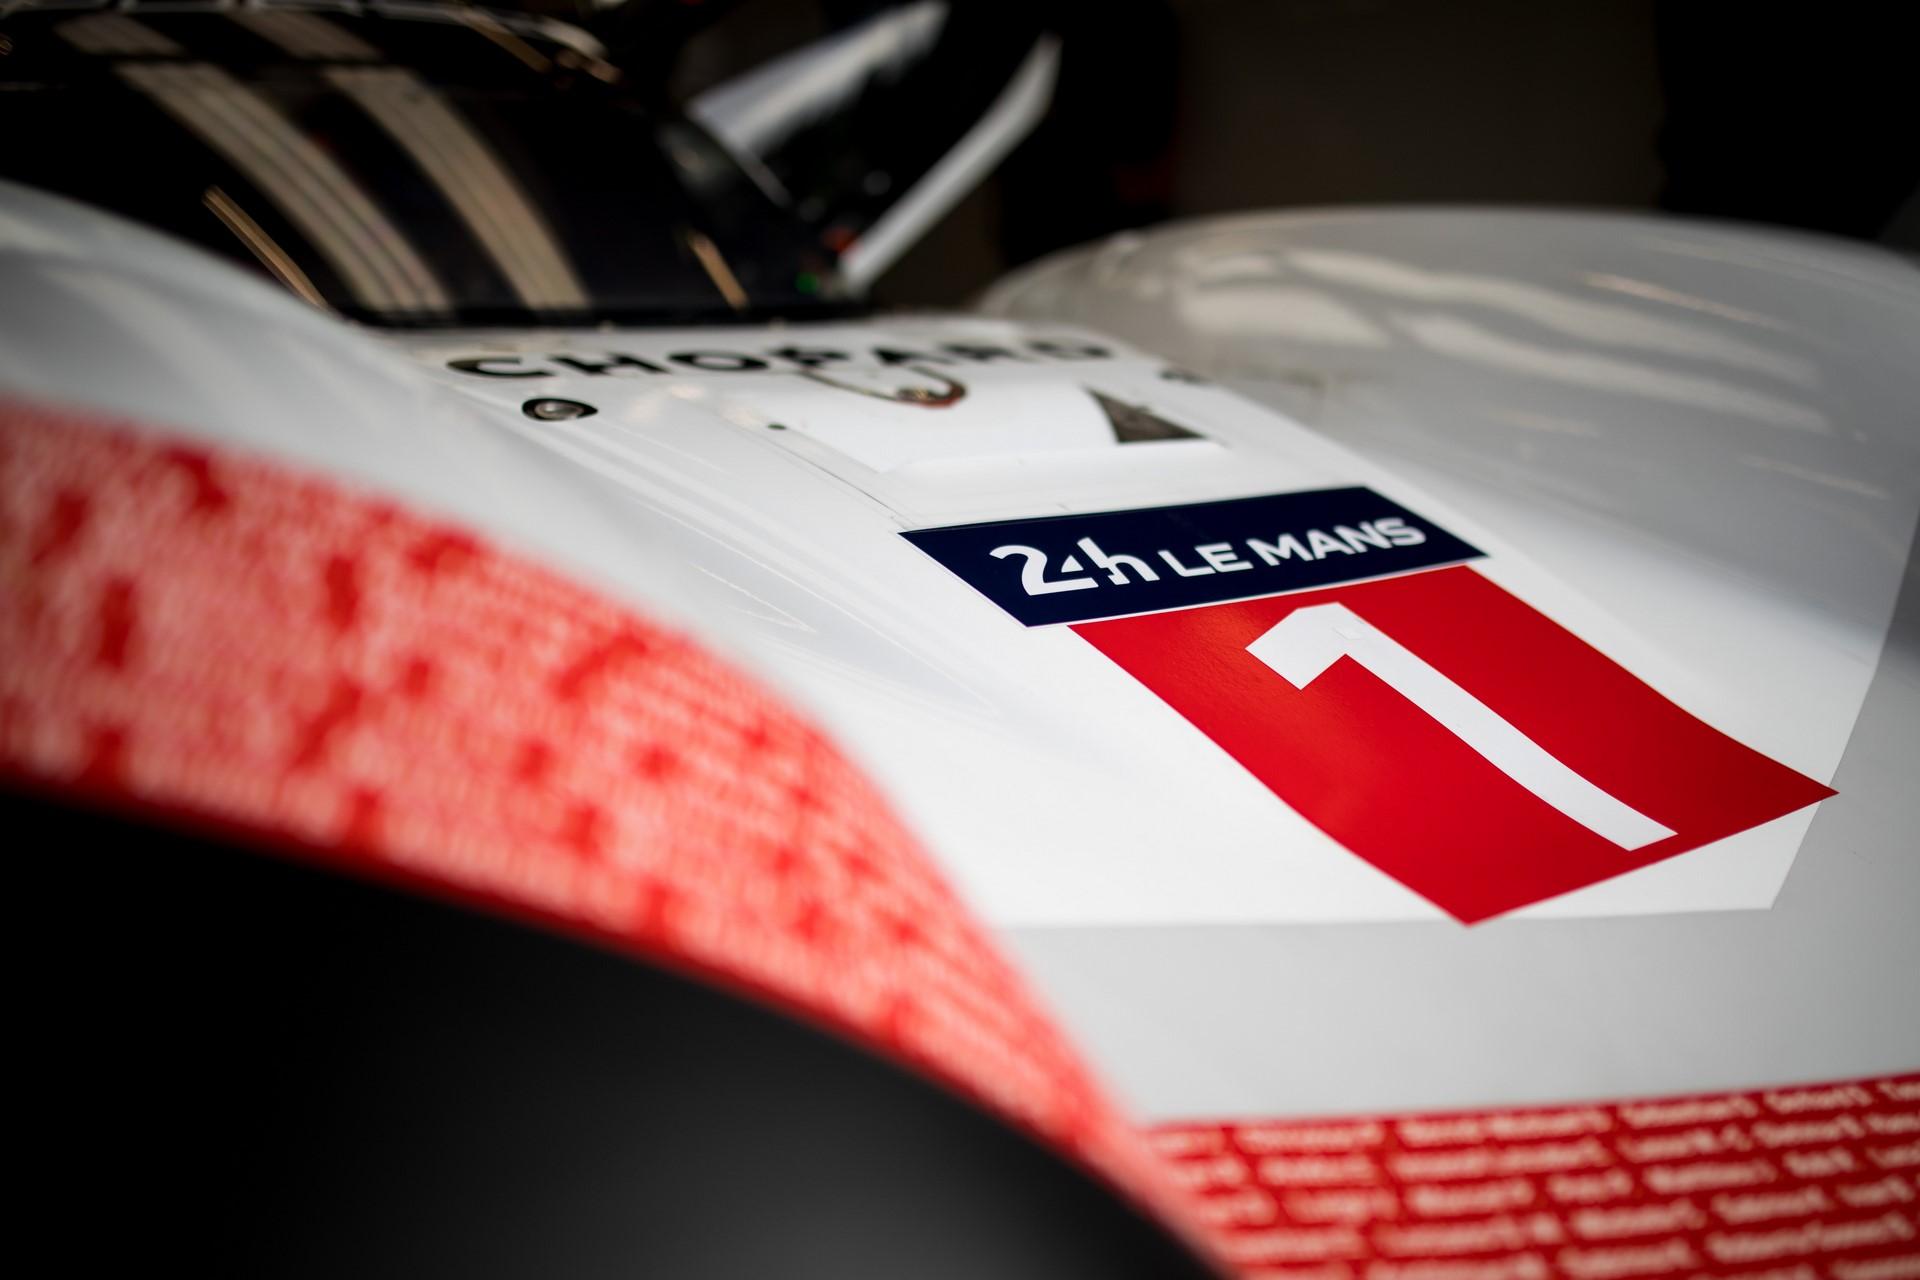 Porsche 919 Hybrid Evo Spa Record (33)